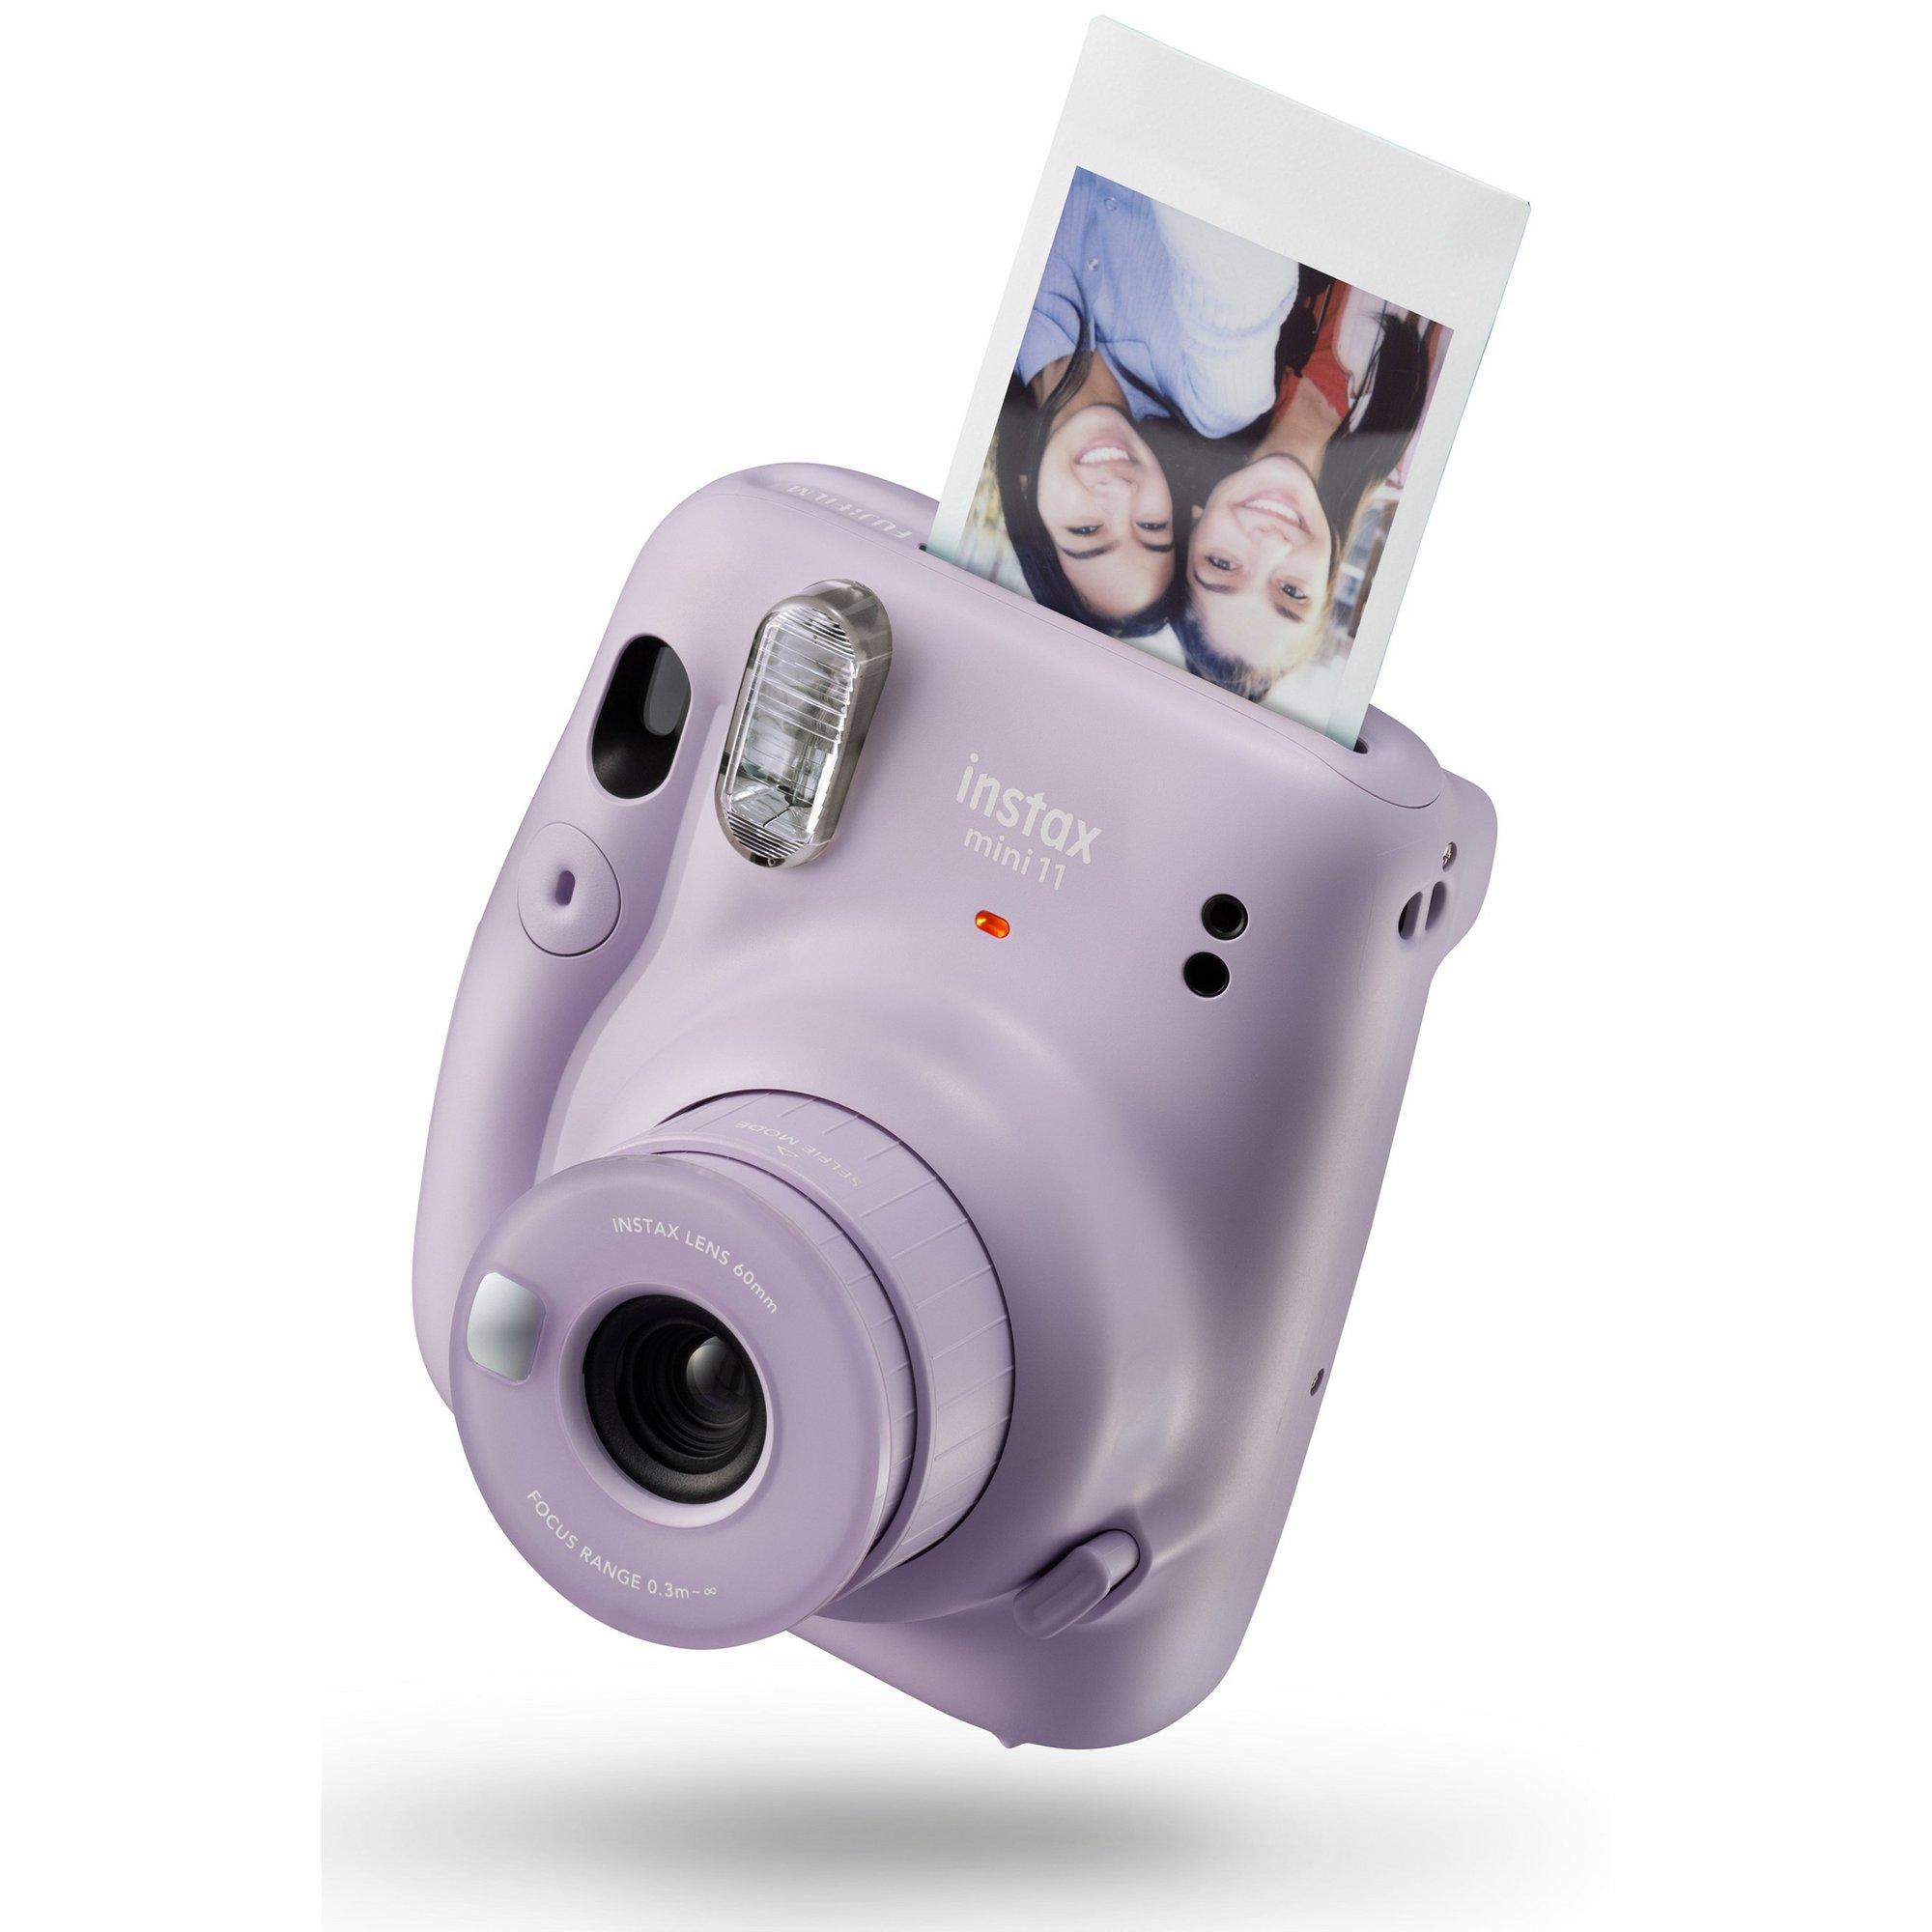 Image of Fujifilm Instax Mini 11 Instant Camera including 20 Shots